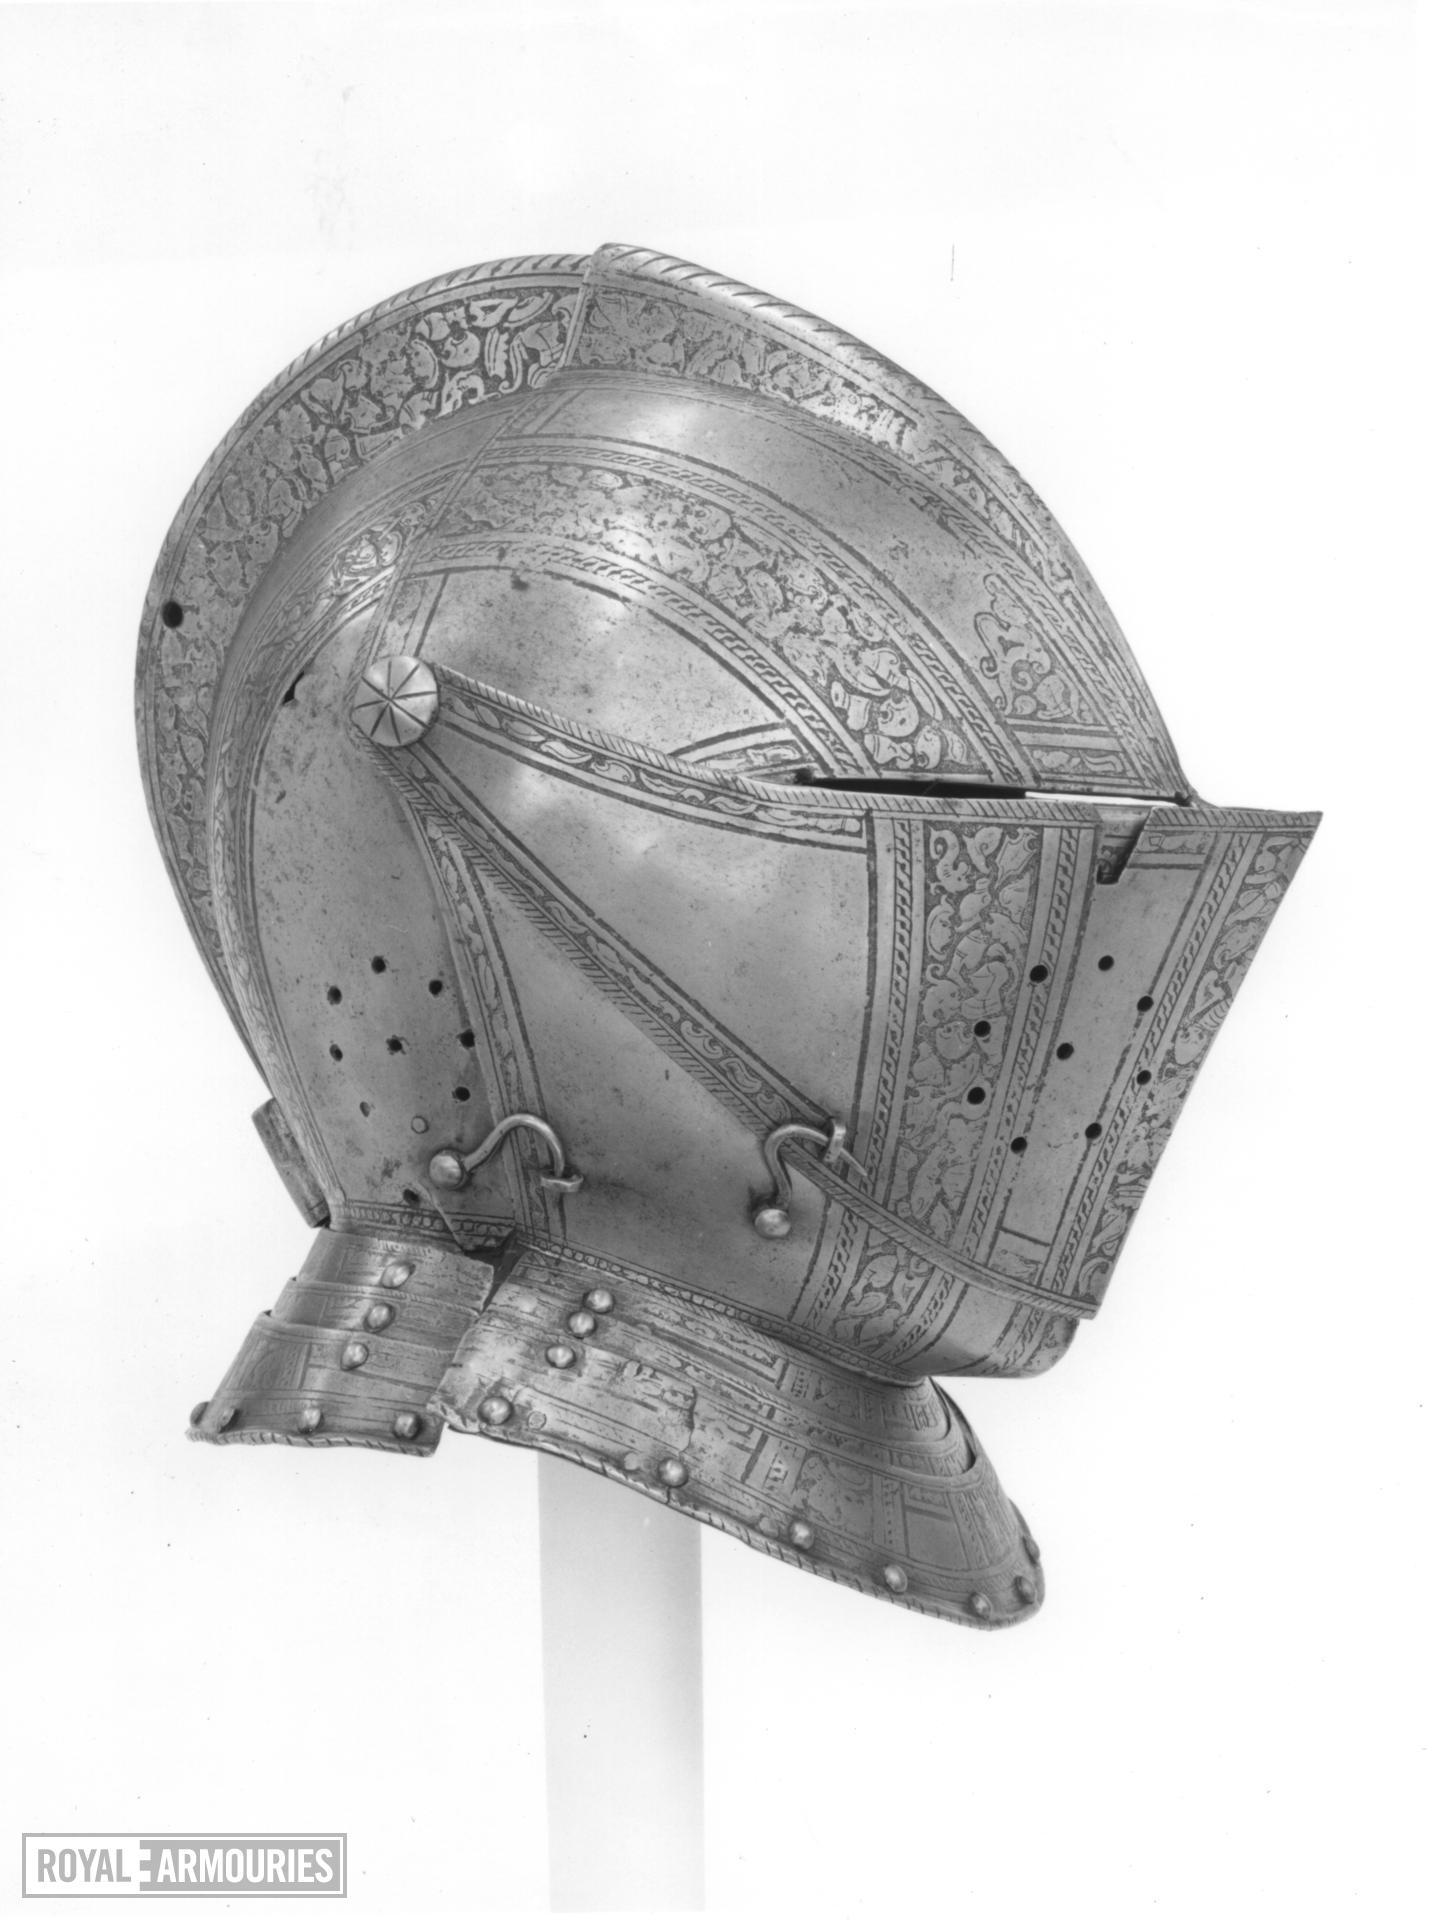 Field armour